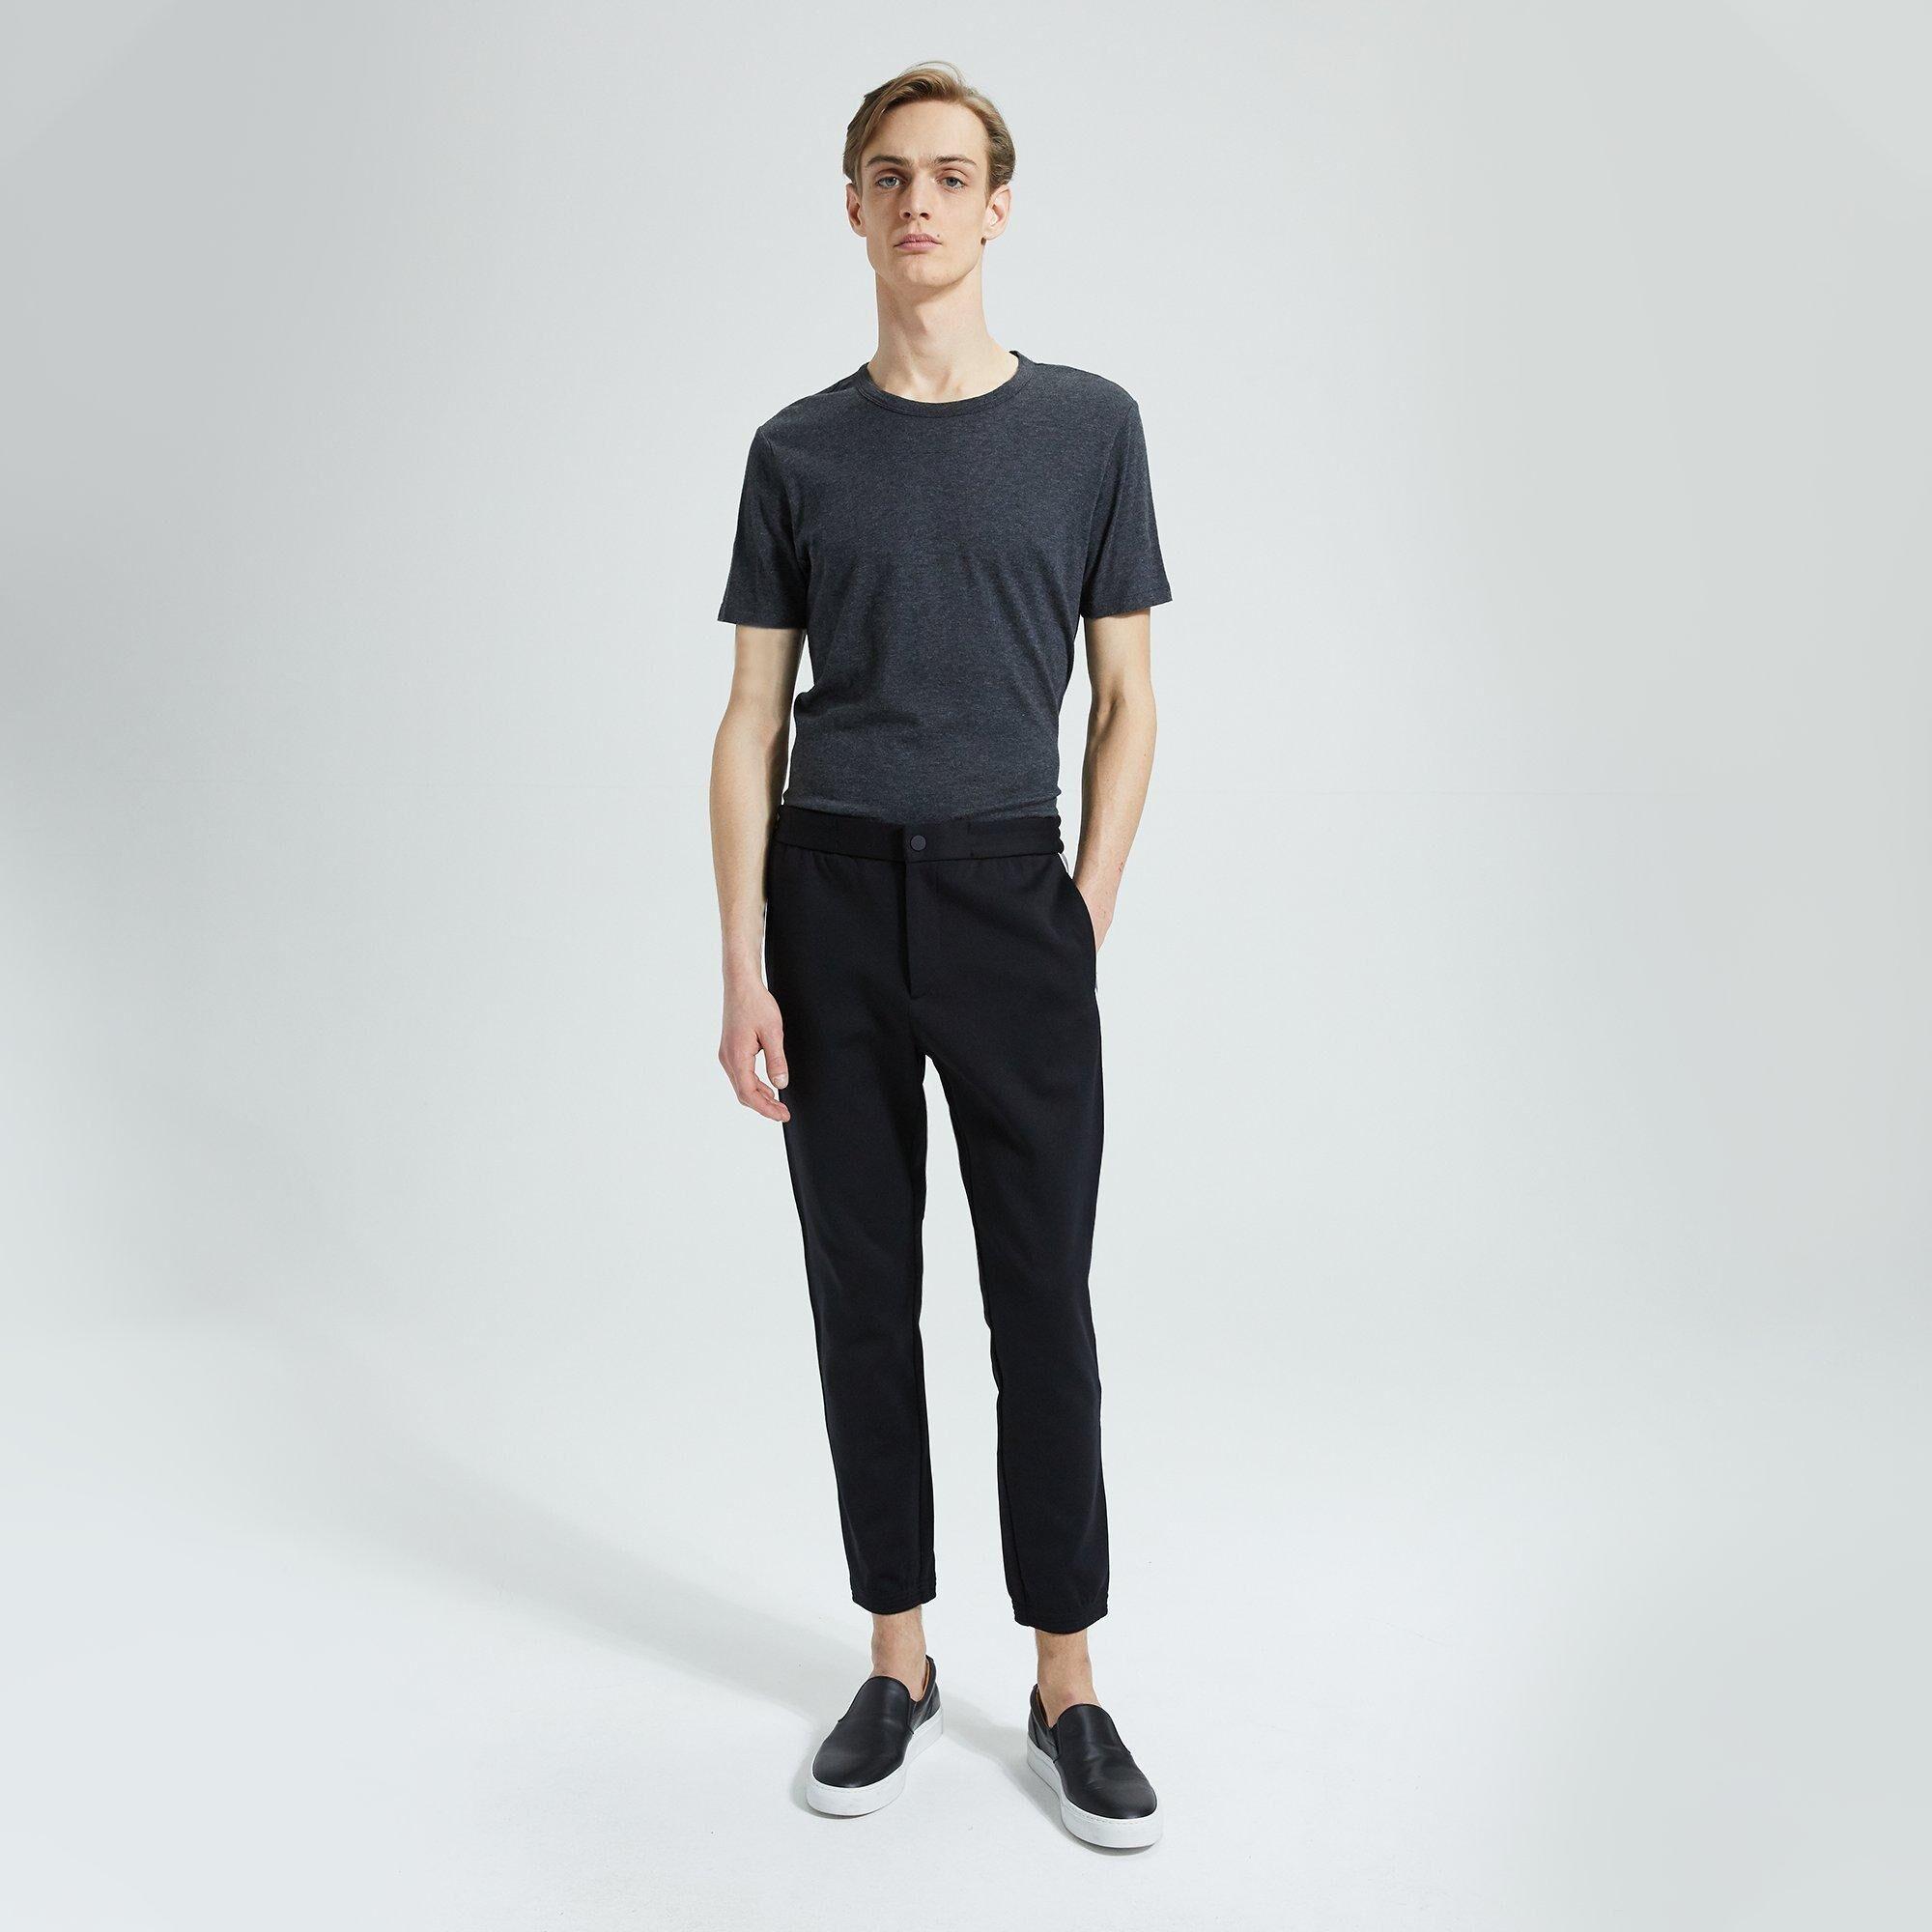 Theory Tech Face Ponte Terrance Pant  - BLACK - male - Size: Large